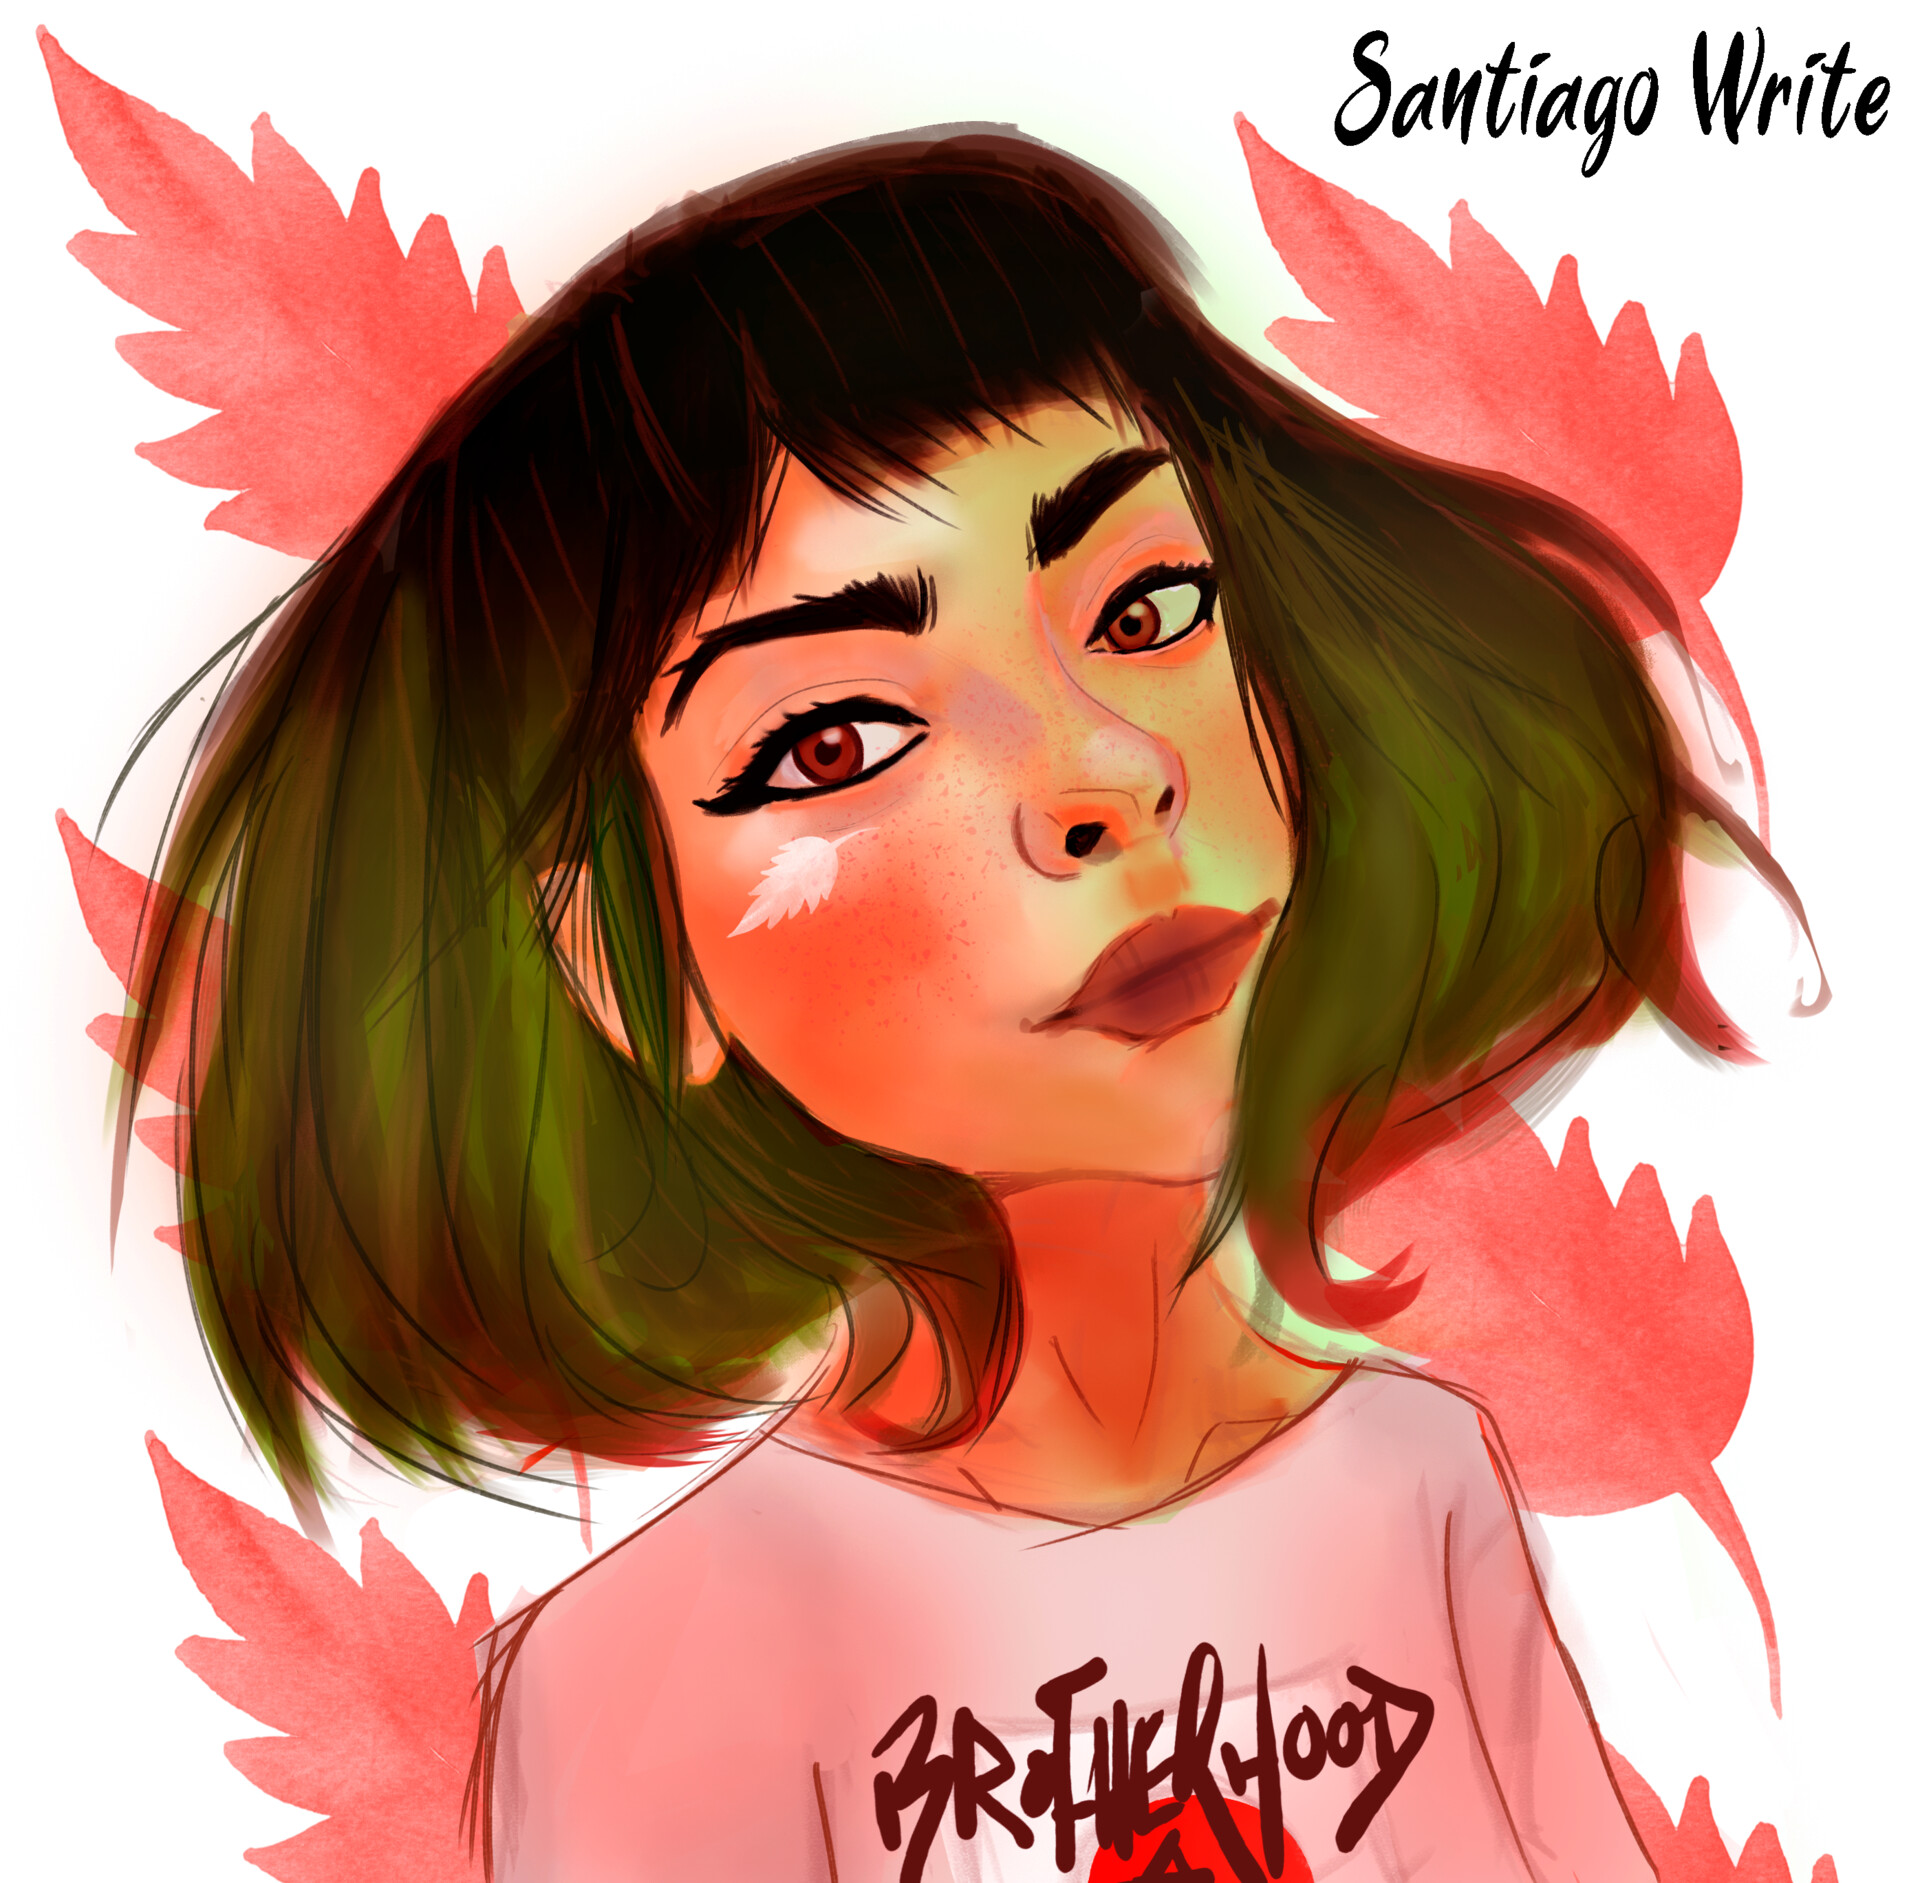 Santiago write woman 1